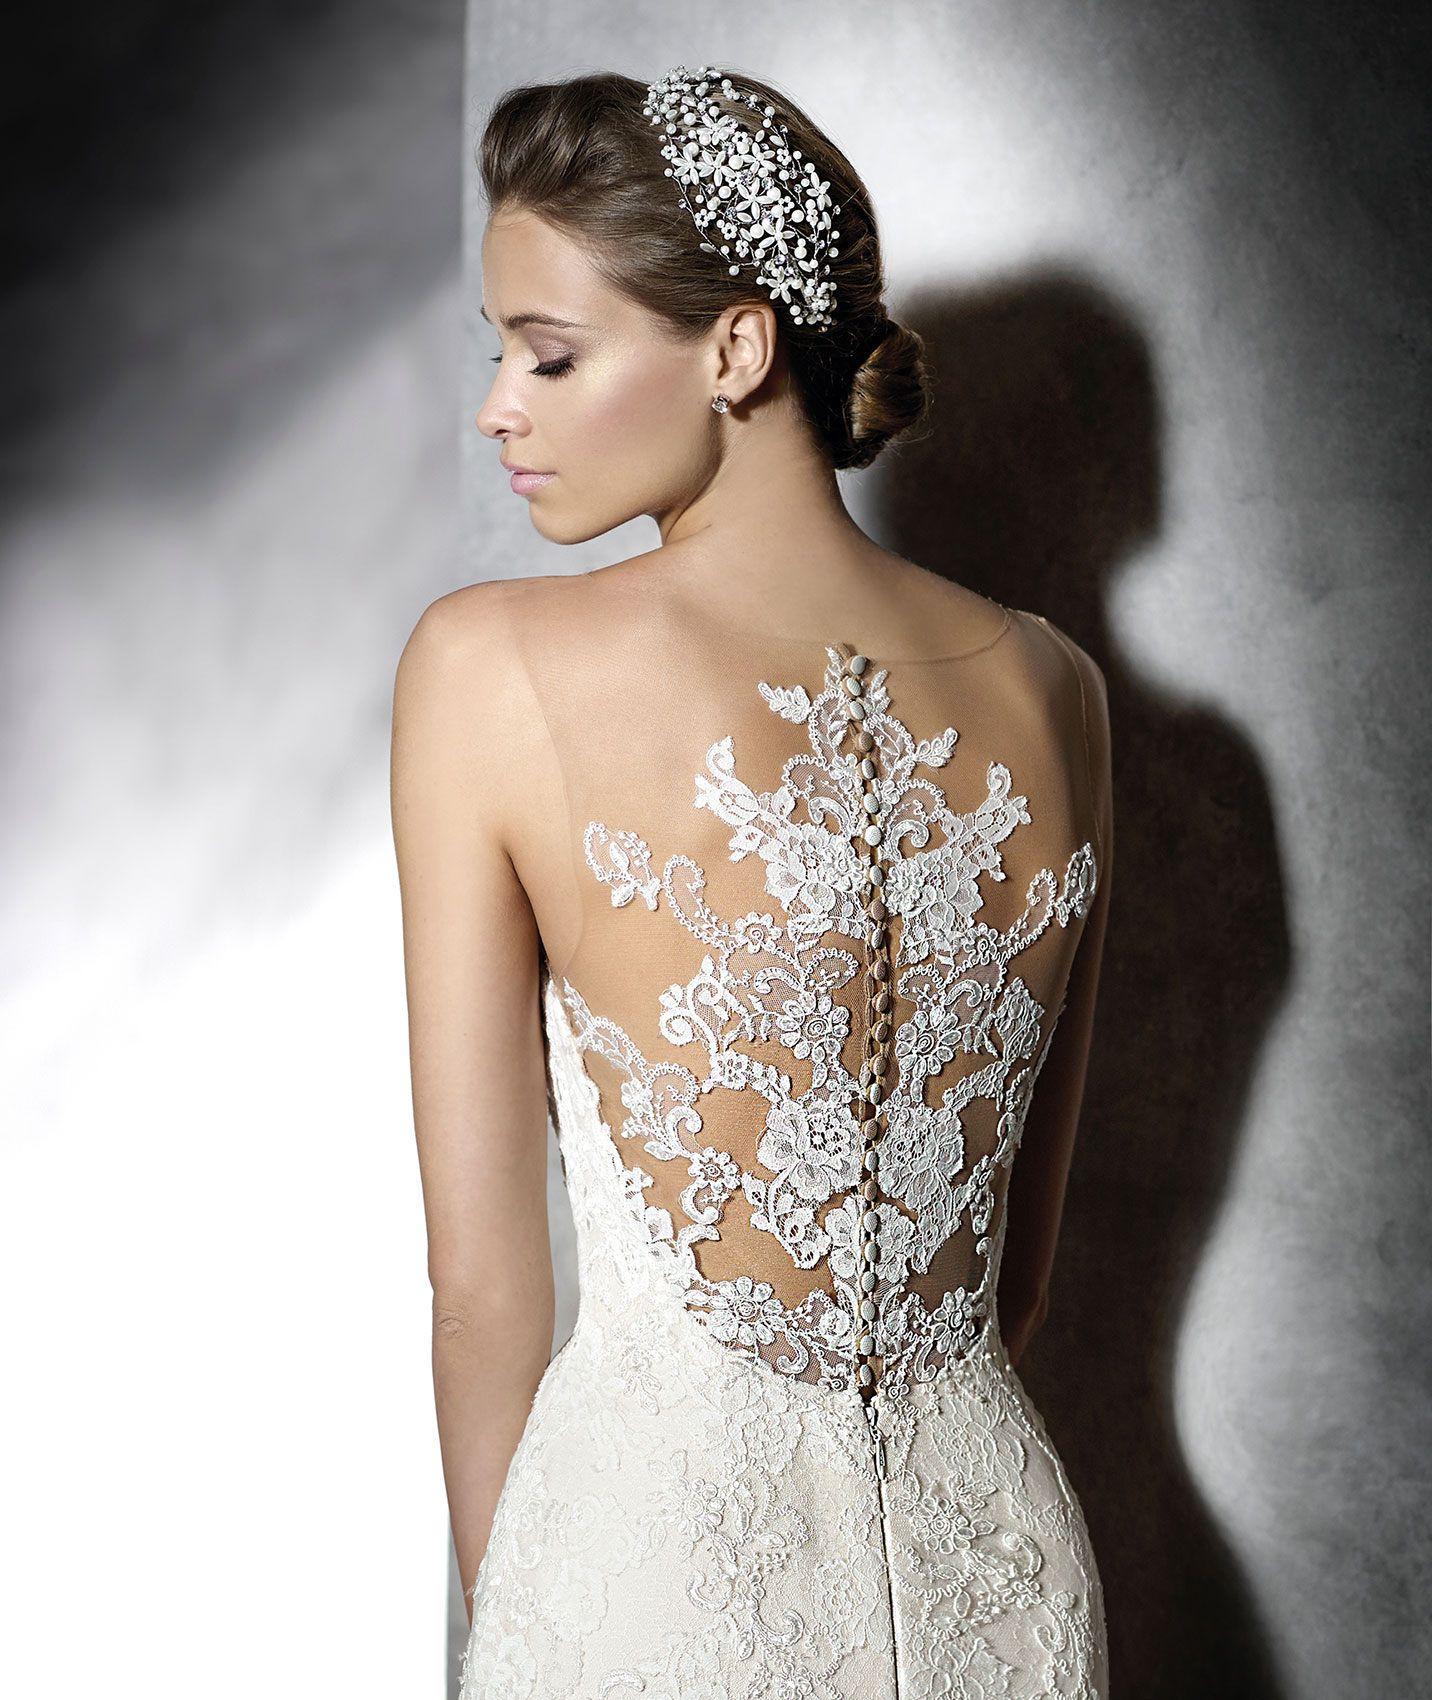 Robe De Mariée Pronovias 2016 Modèle Printella Encaje